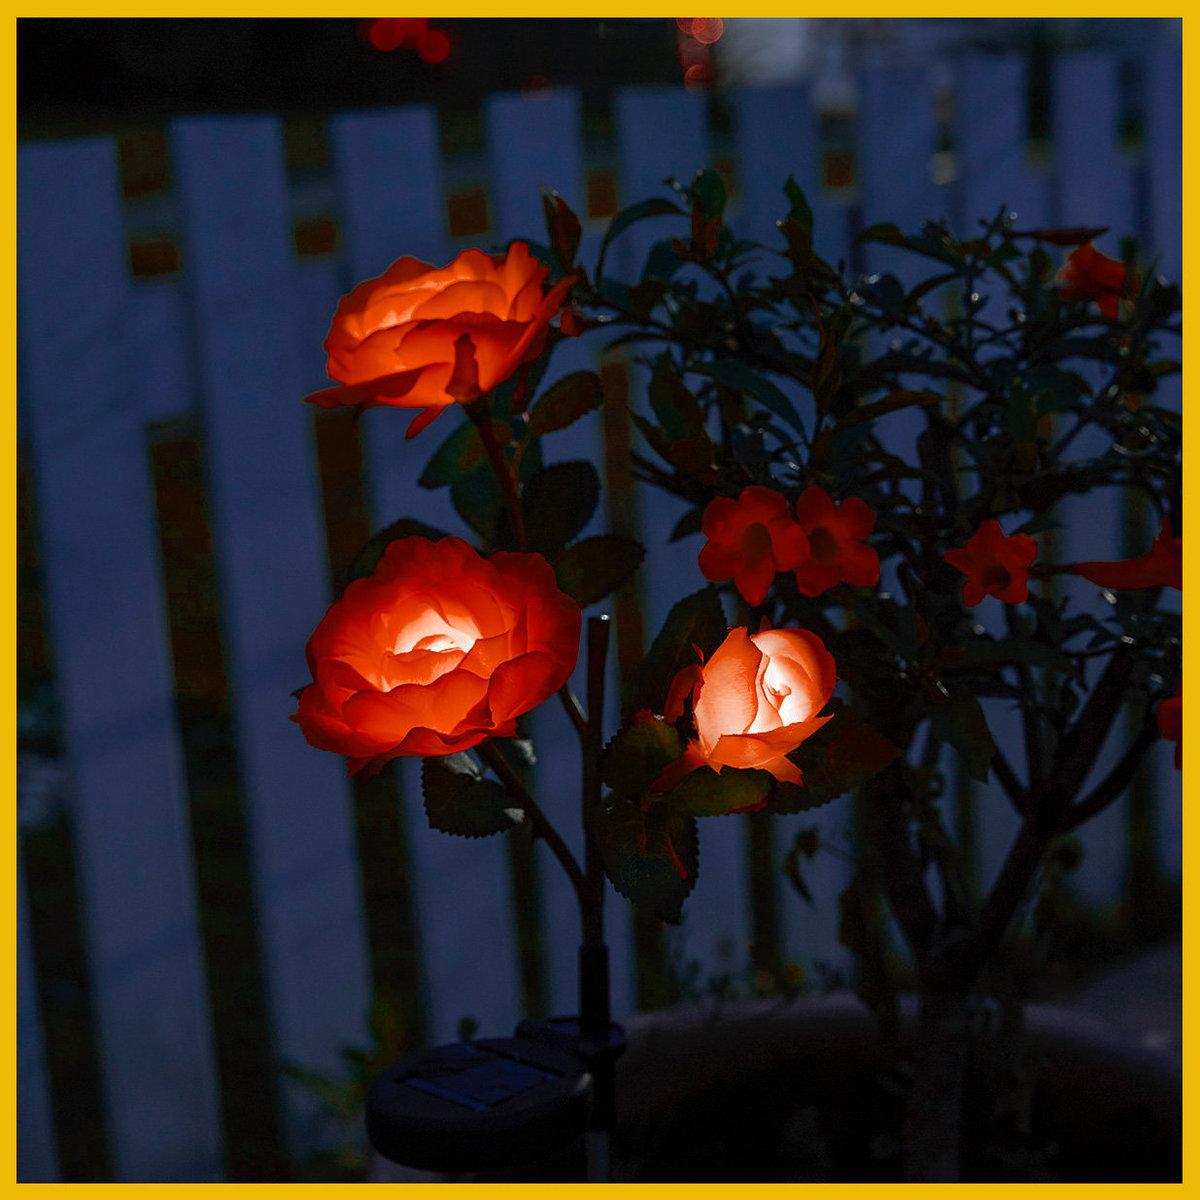 Solar Powered LED Rose Stake (Red)